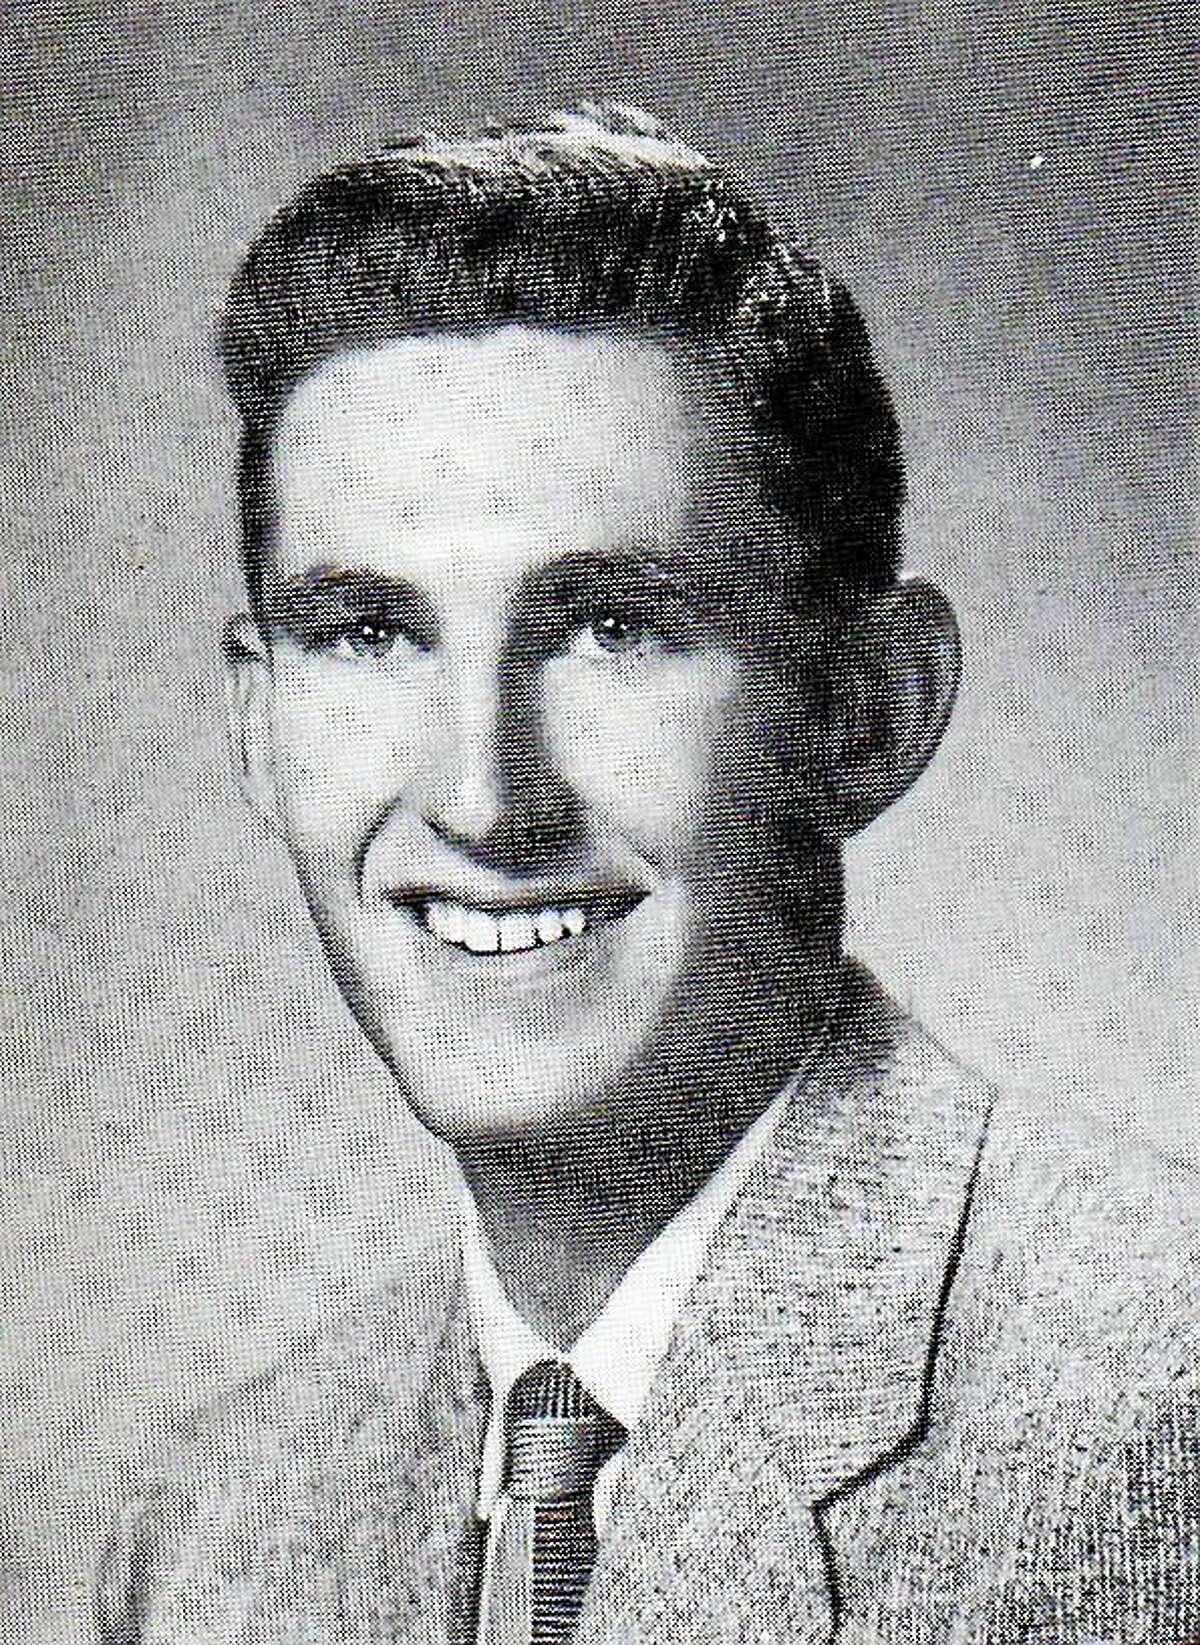 Ron Lineweber